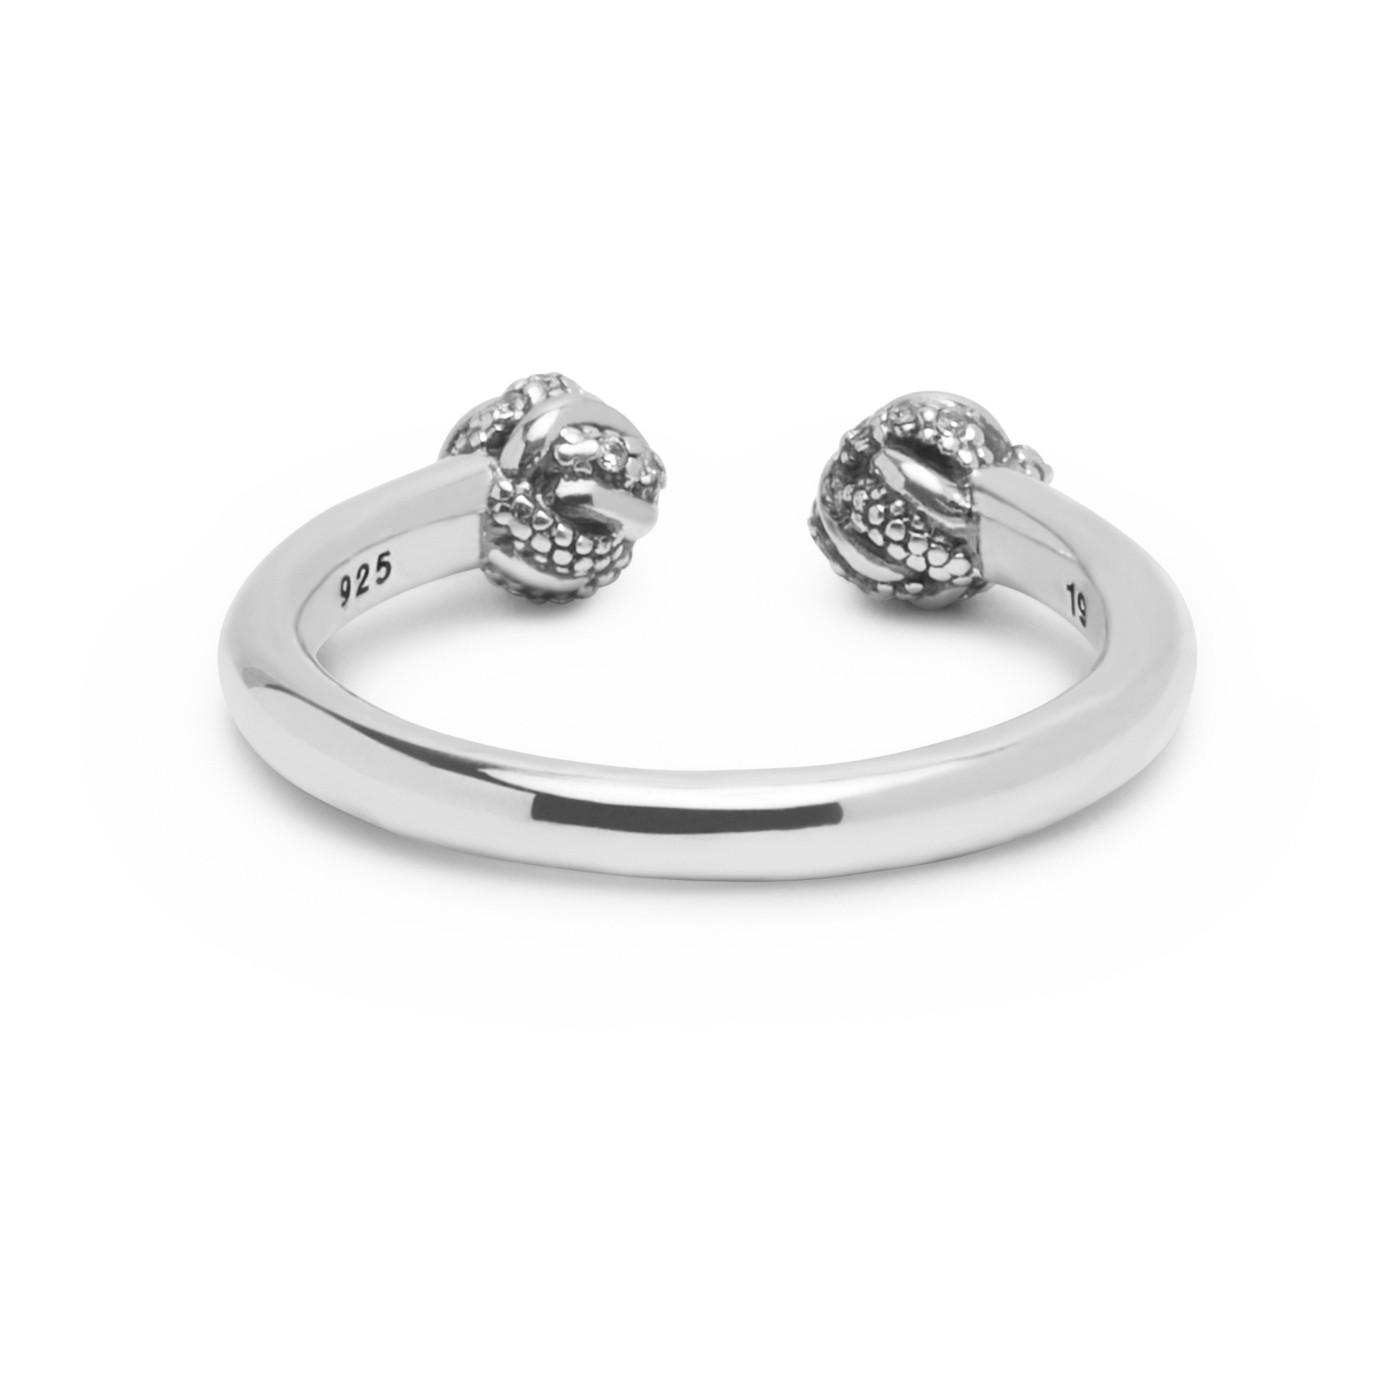 Buddha to Buddha 013WZ Ring Refined Katja zilver met zirconia Maat 18